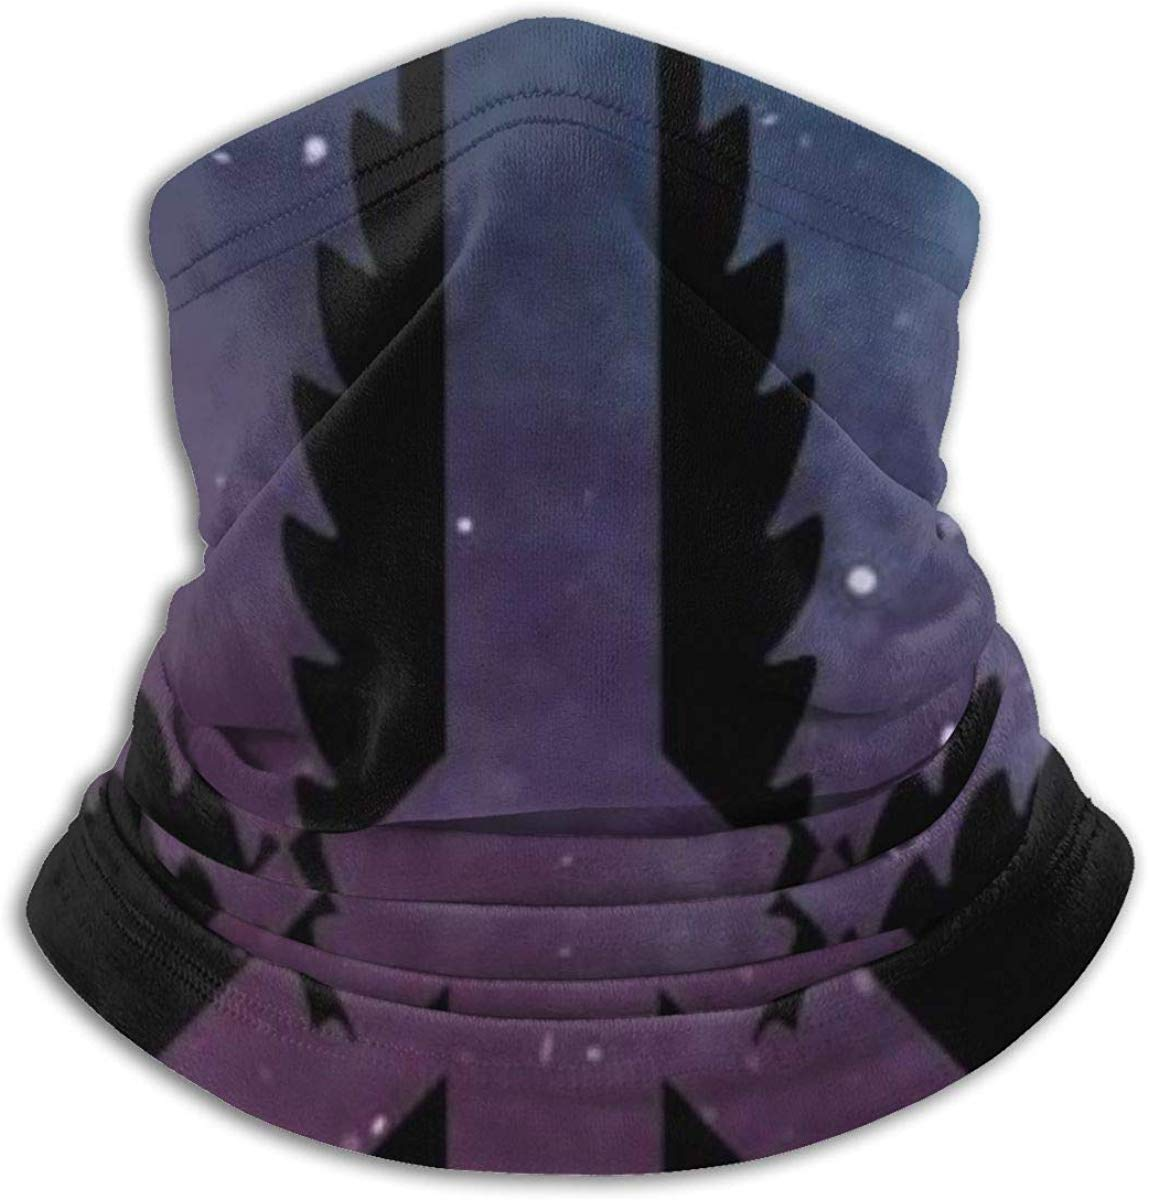 Galaxy 420 Cannabis Peace Fleece Neck Gaiter Warmer Winter Windproof Ski Face Mask Balaclava Half Mask For Women Men